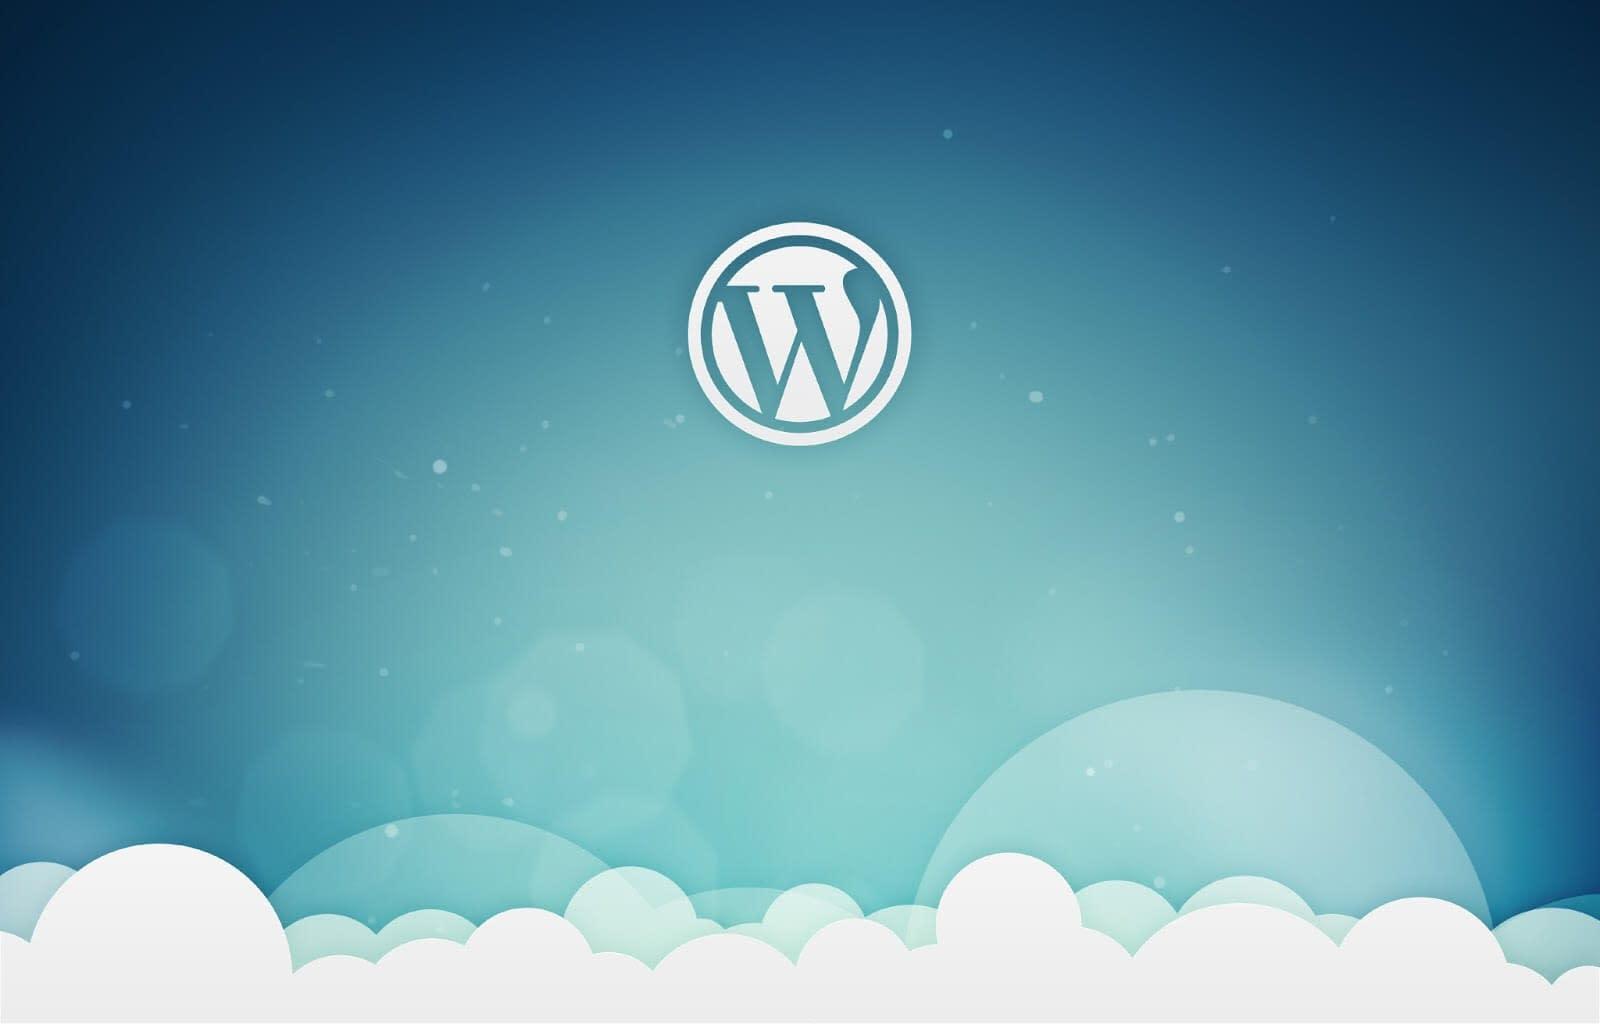 Wordpress-Wallpaper-4